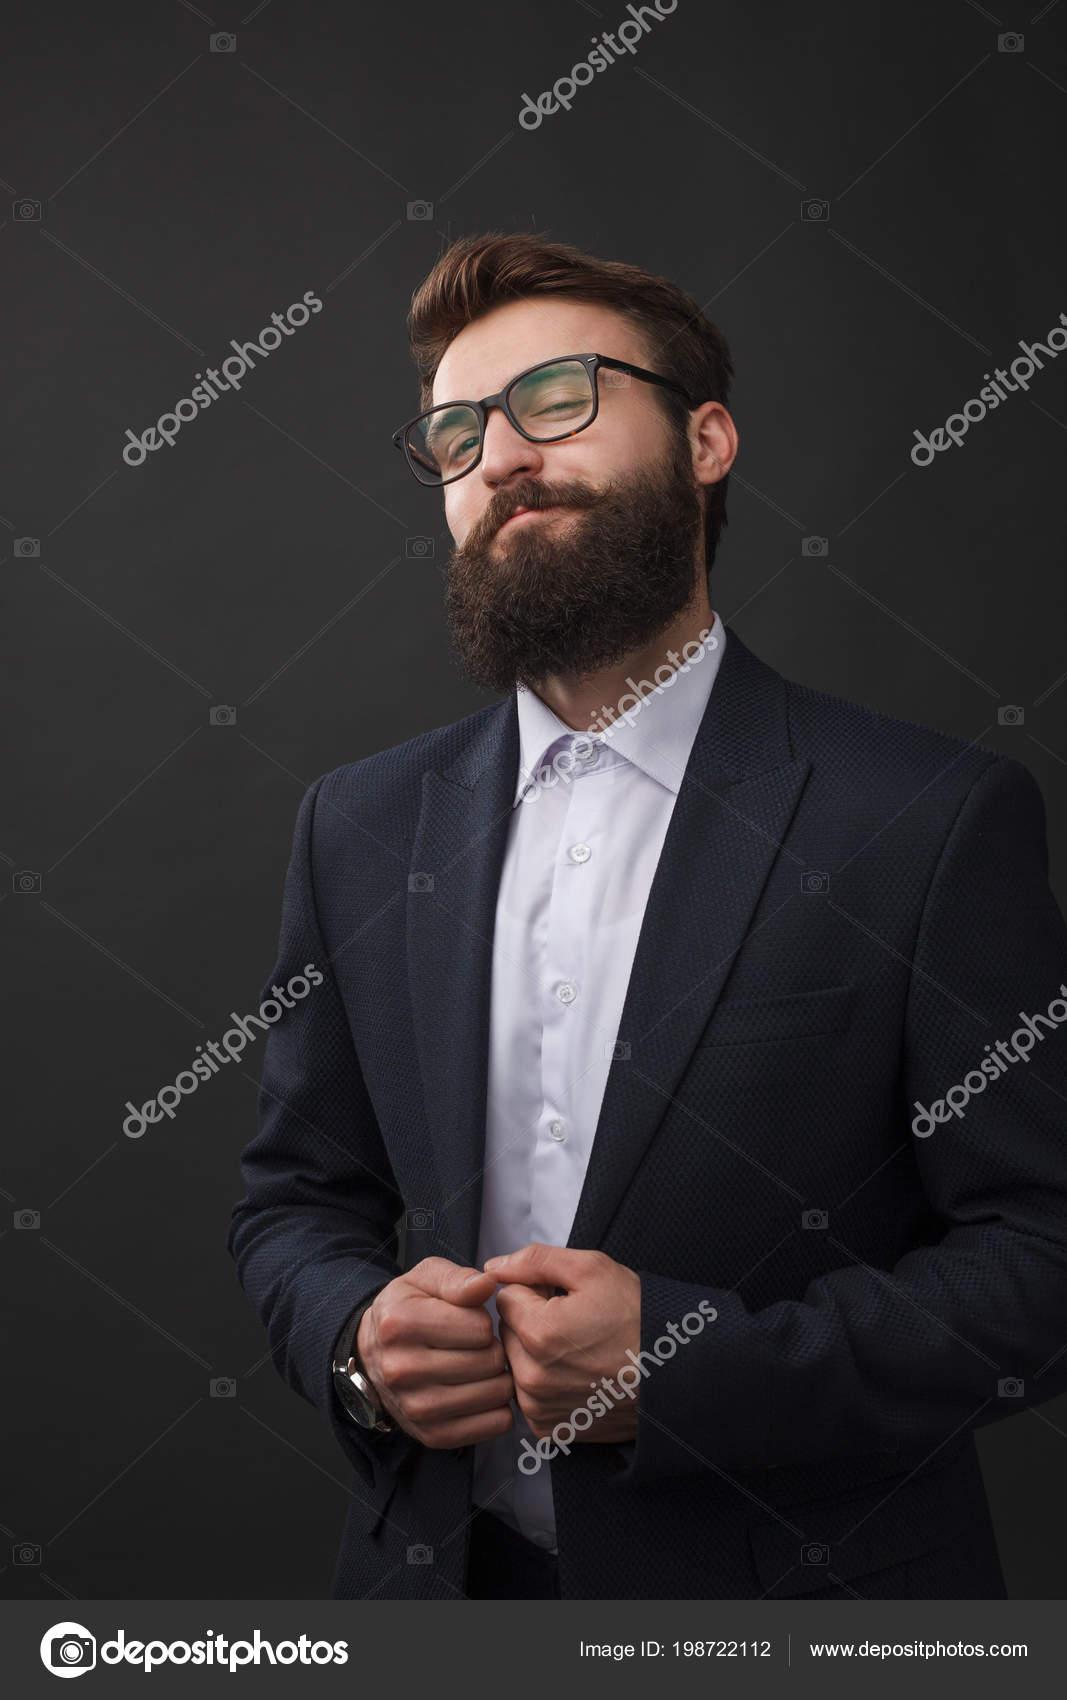 Classy guy